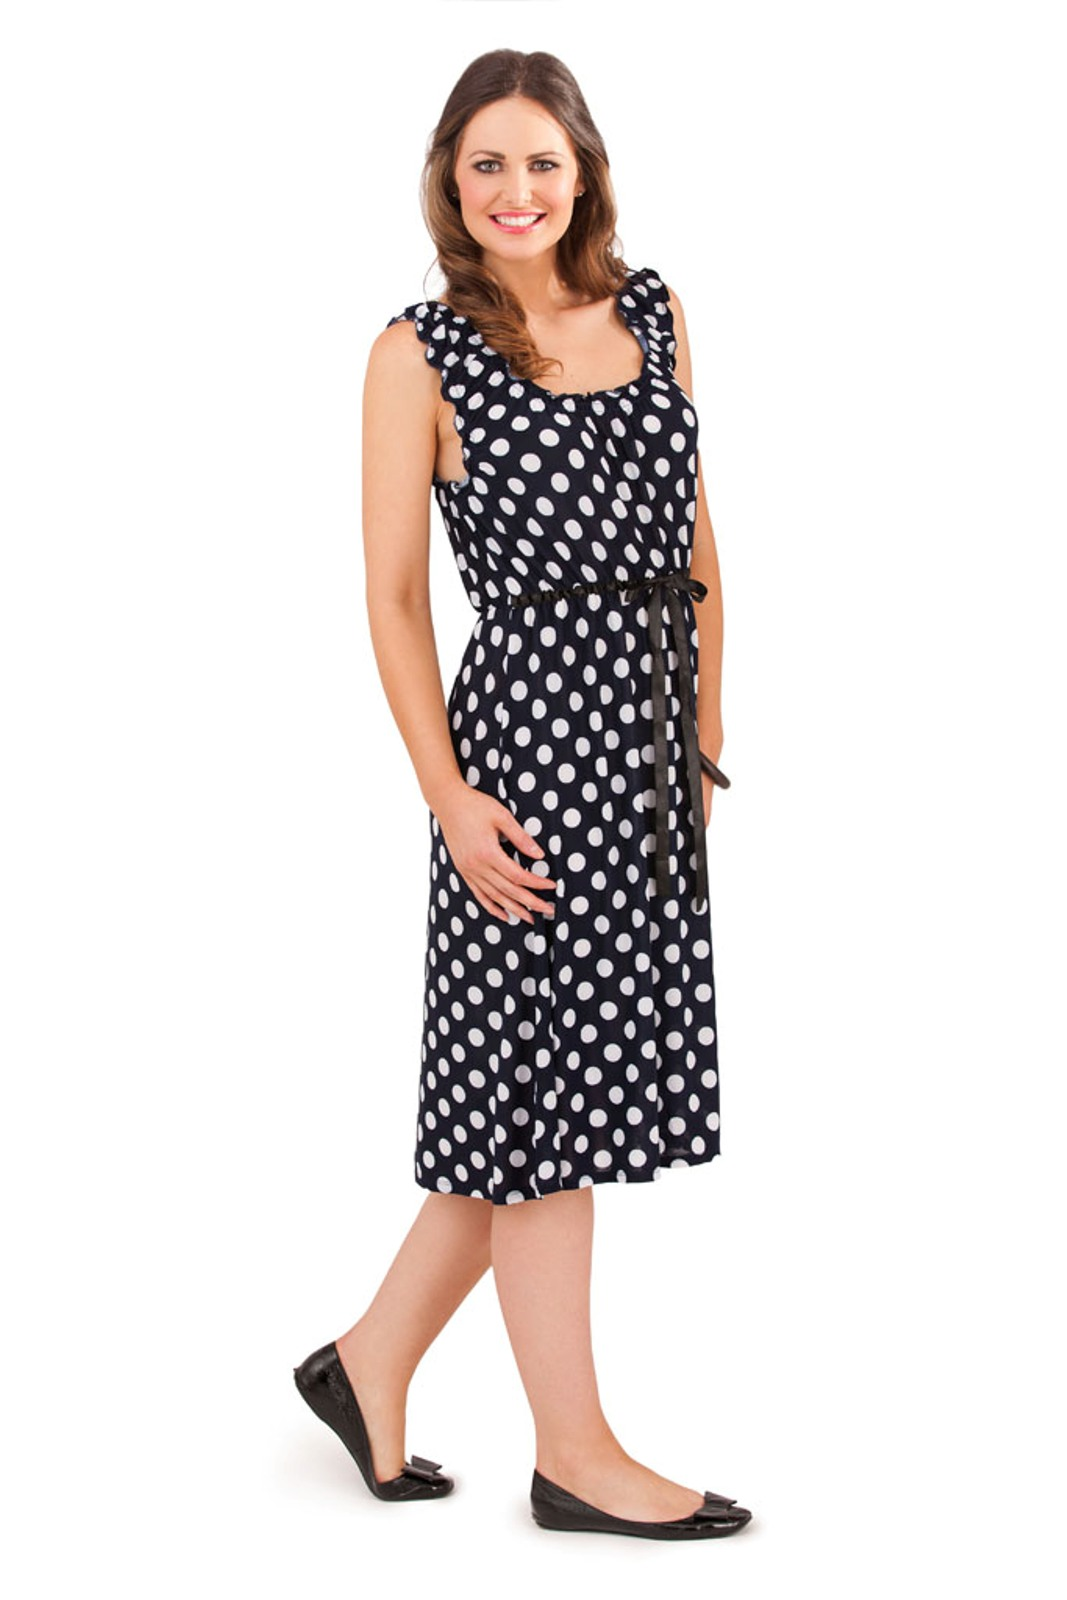 Womens Polka Dot Mid Knee Length Summer Dress Spot Design Ladies ...